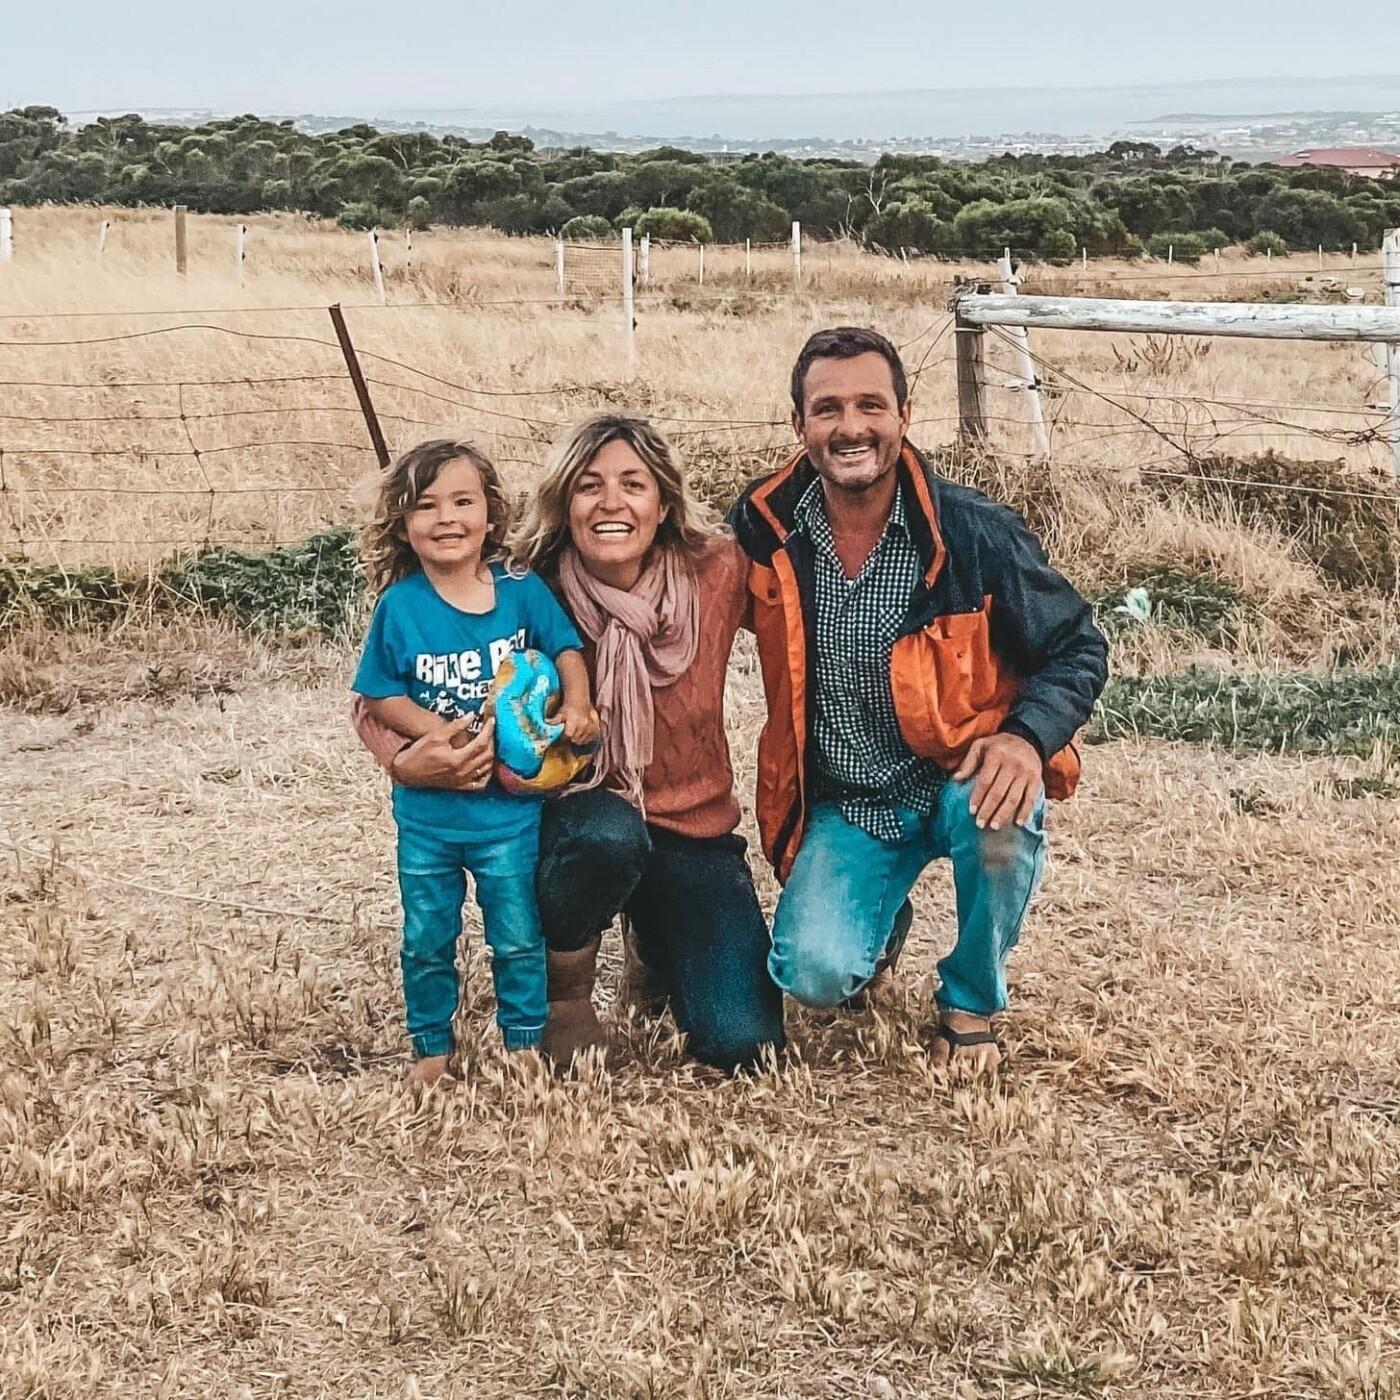 Jenny, Nathan, Louie, Merlot visitent l'Australie - 03 09 2021 - StereoChic Radio